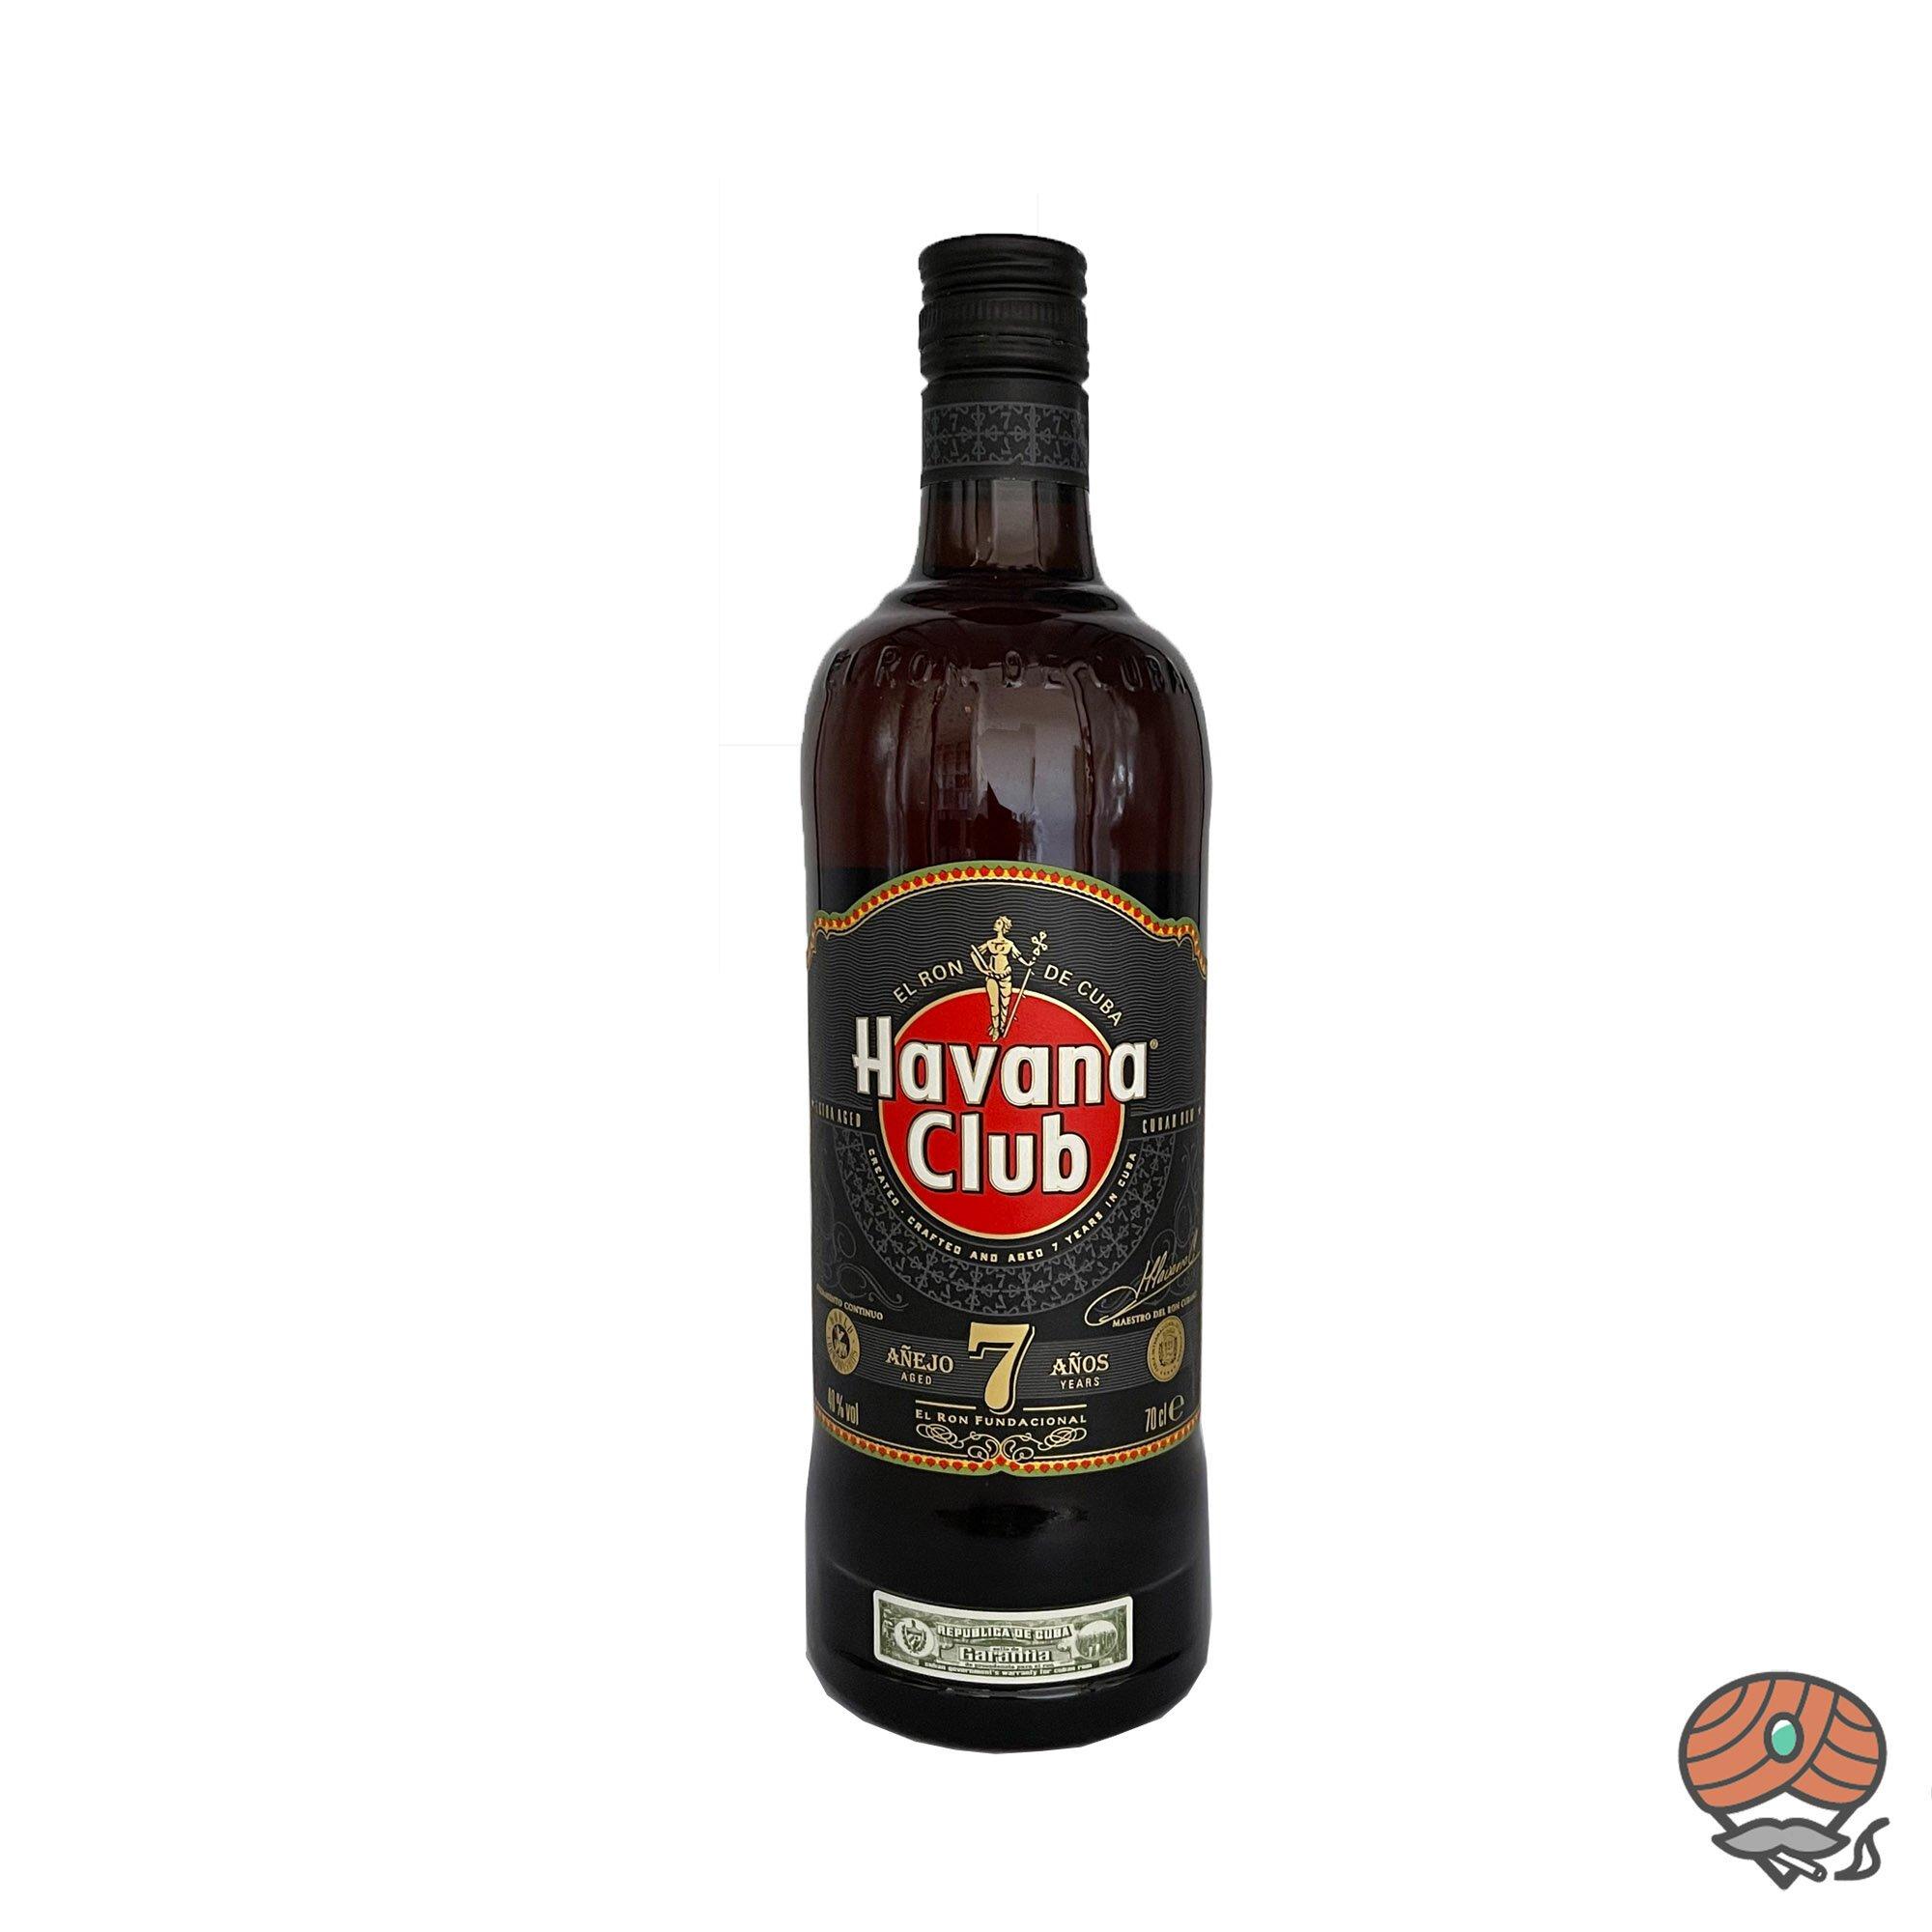 Havana Club 7 Años  Rum 0,7l, alc. 40 Vol.-%